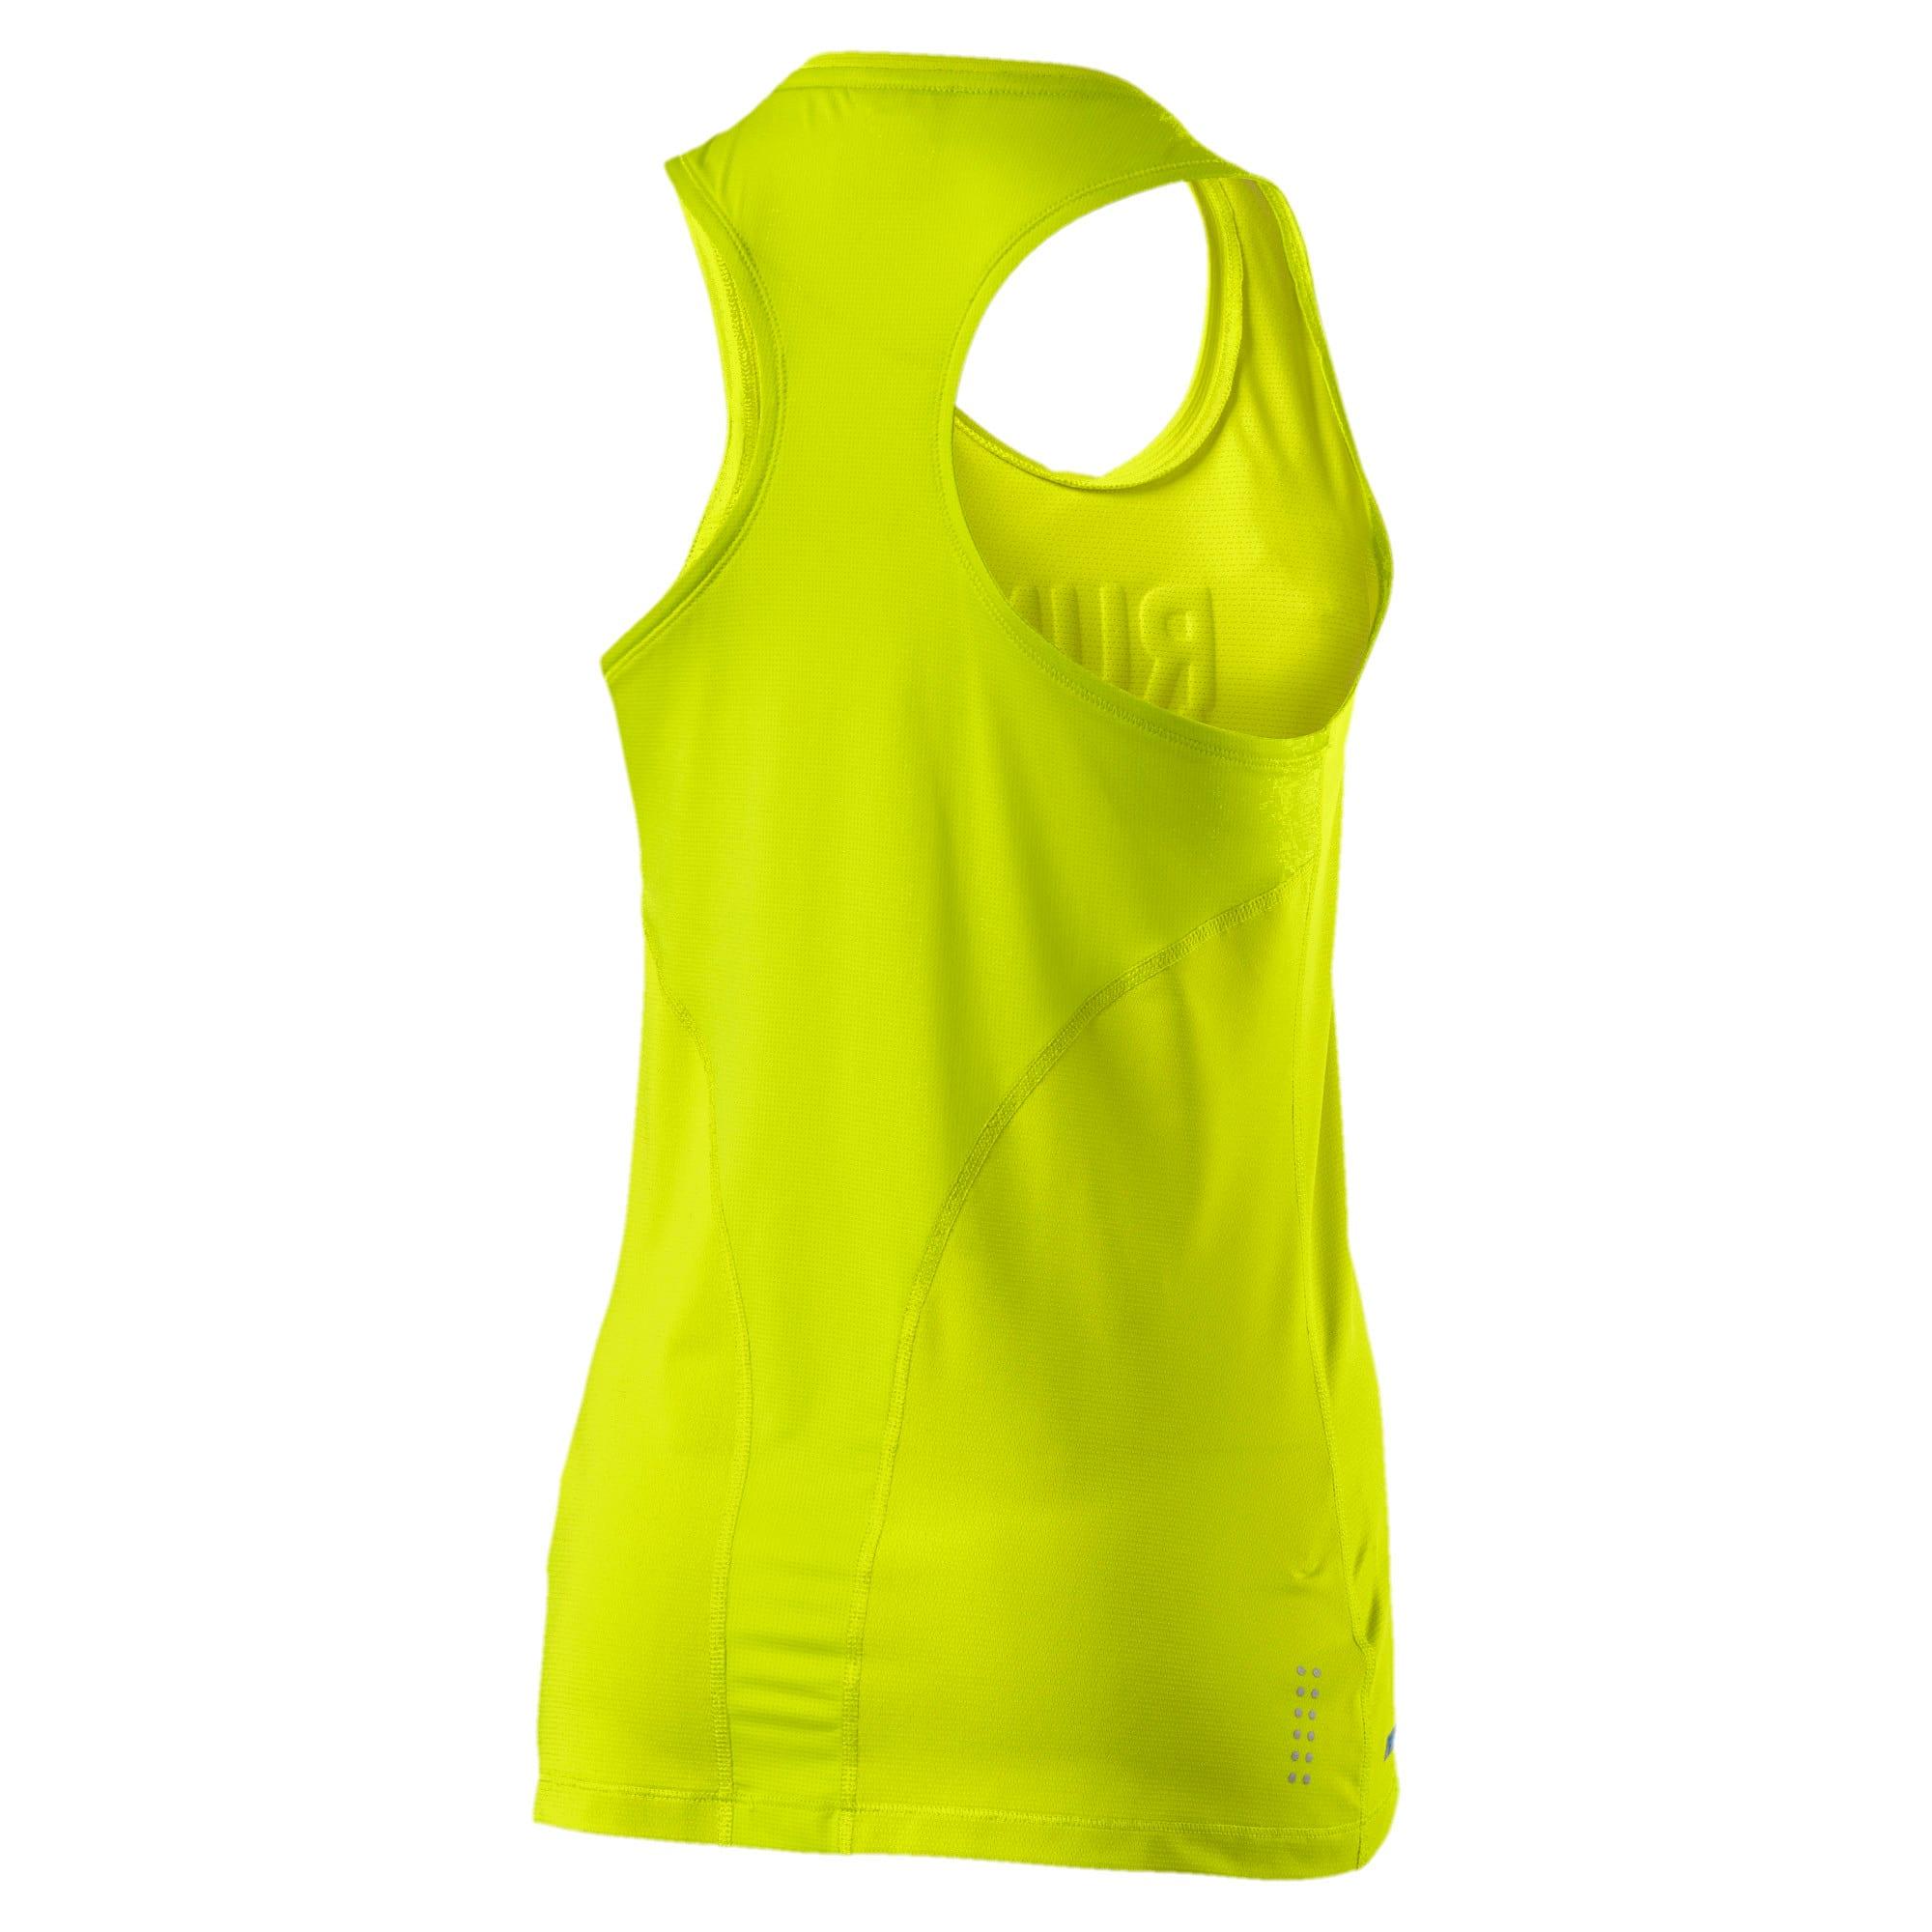 Thumbnail 4 of Running Women's PWRCOOL Slogan Tank Top, Nrgy Yellow, medium-IND